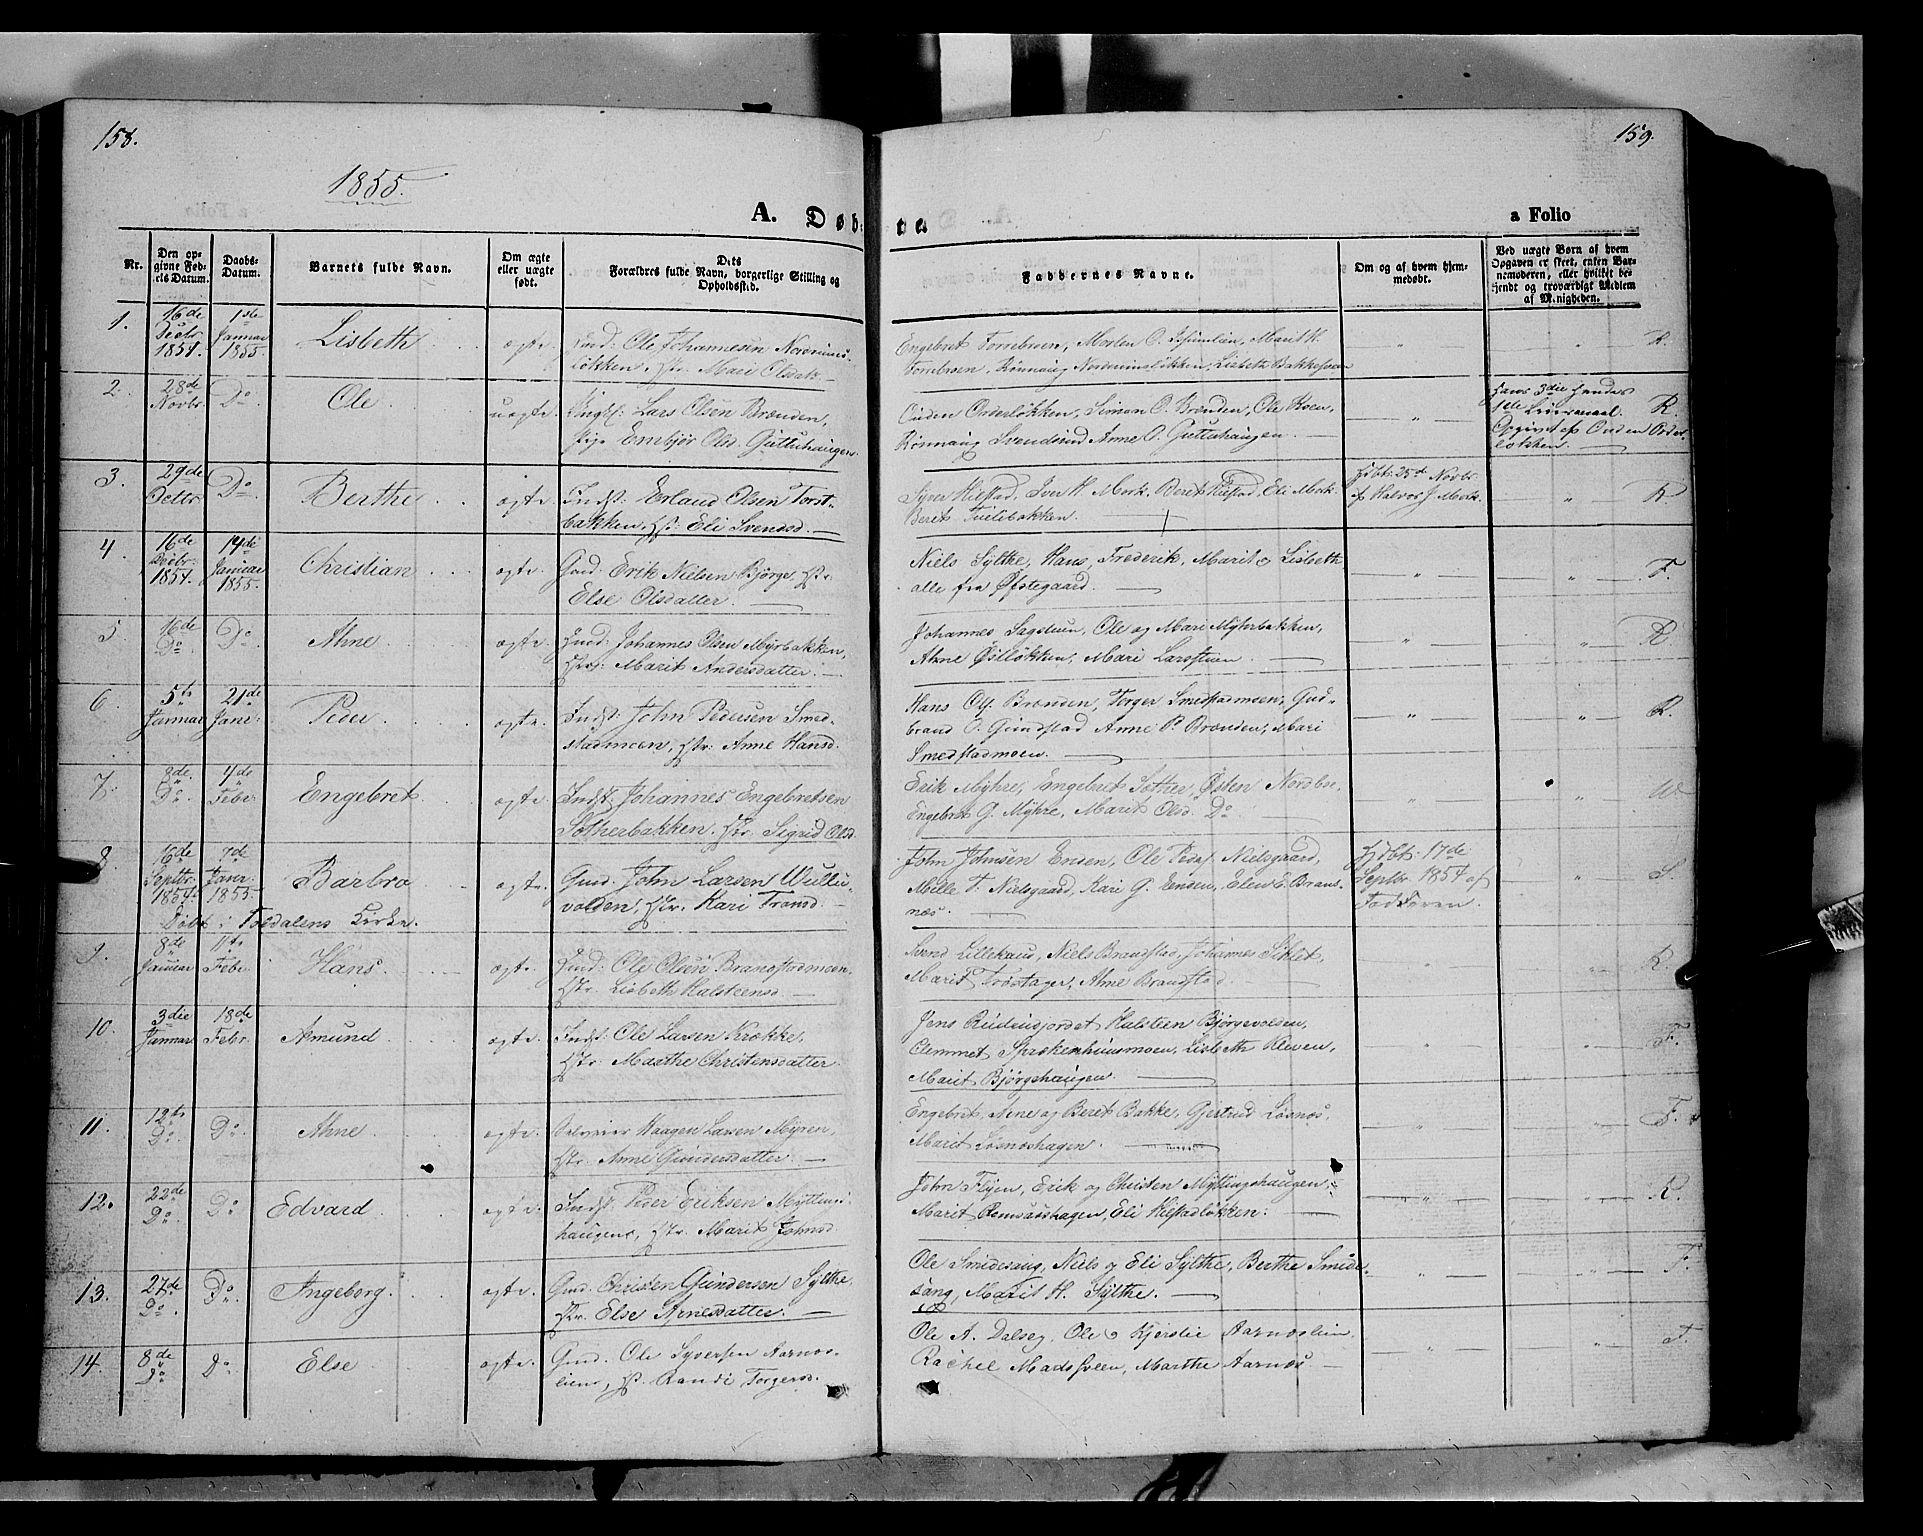 SAH, Ringebu prestekontor, Ministerialbok nr. 6, 1848-1859, s. 158-159